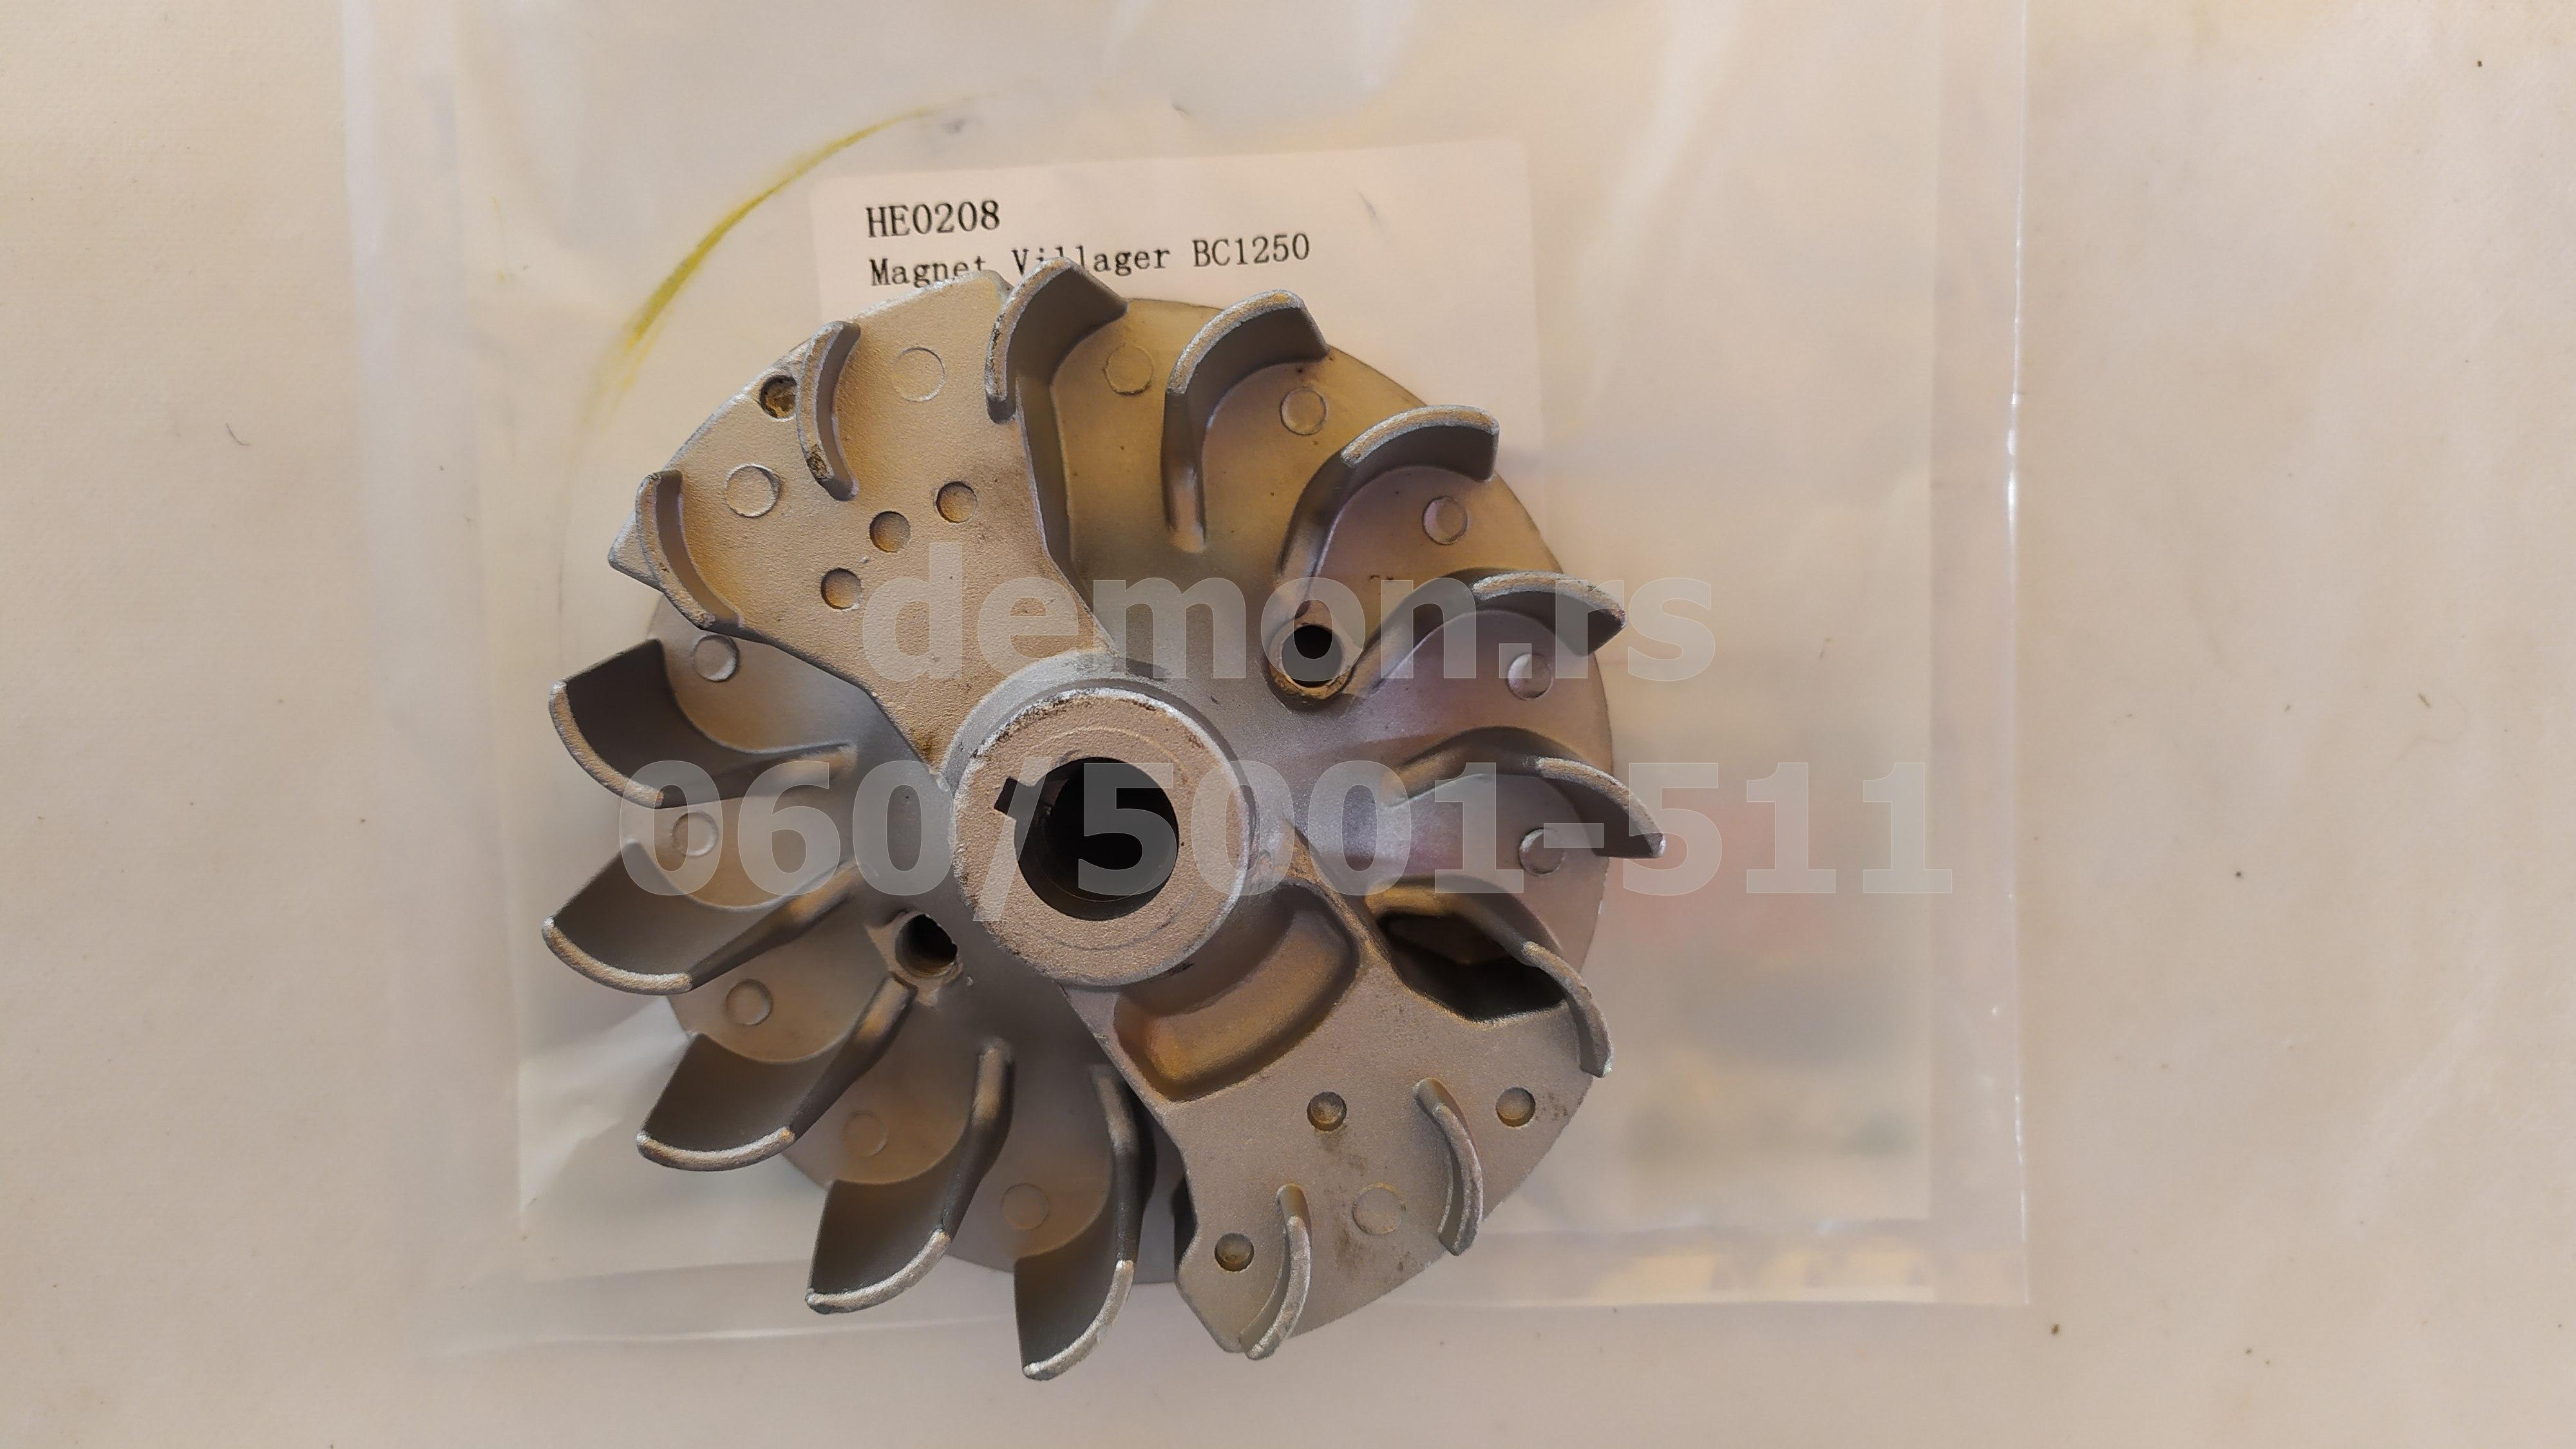 Magnet trimera BC1250 i BC1900 Villager